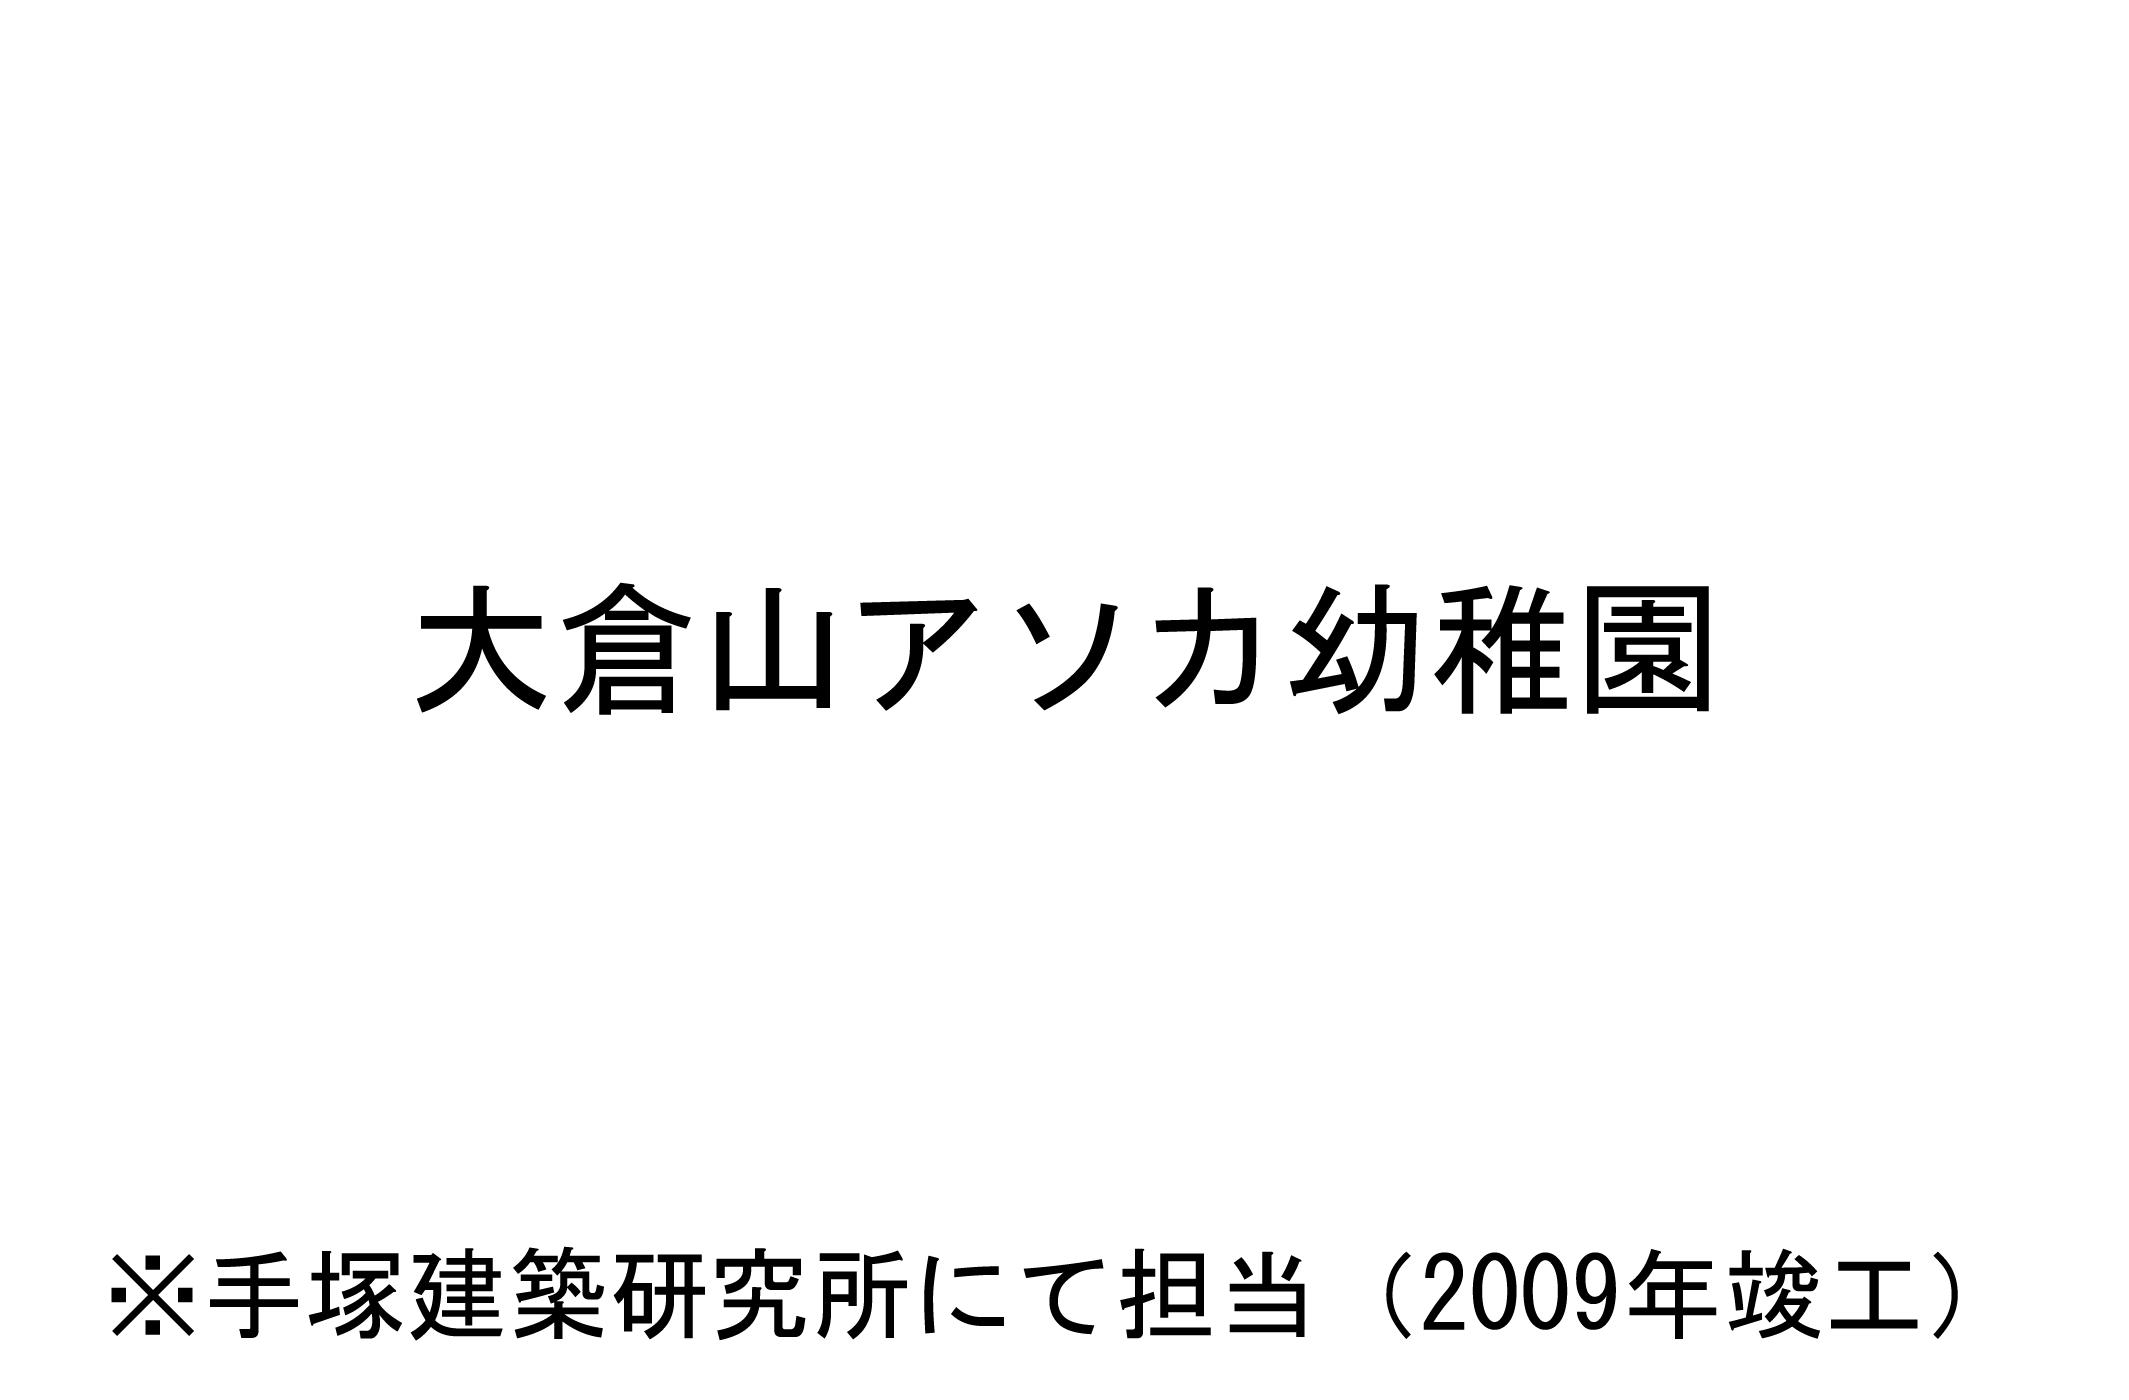 大倉山アソカ幼稚園